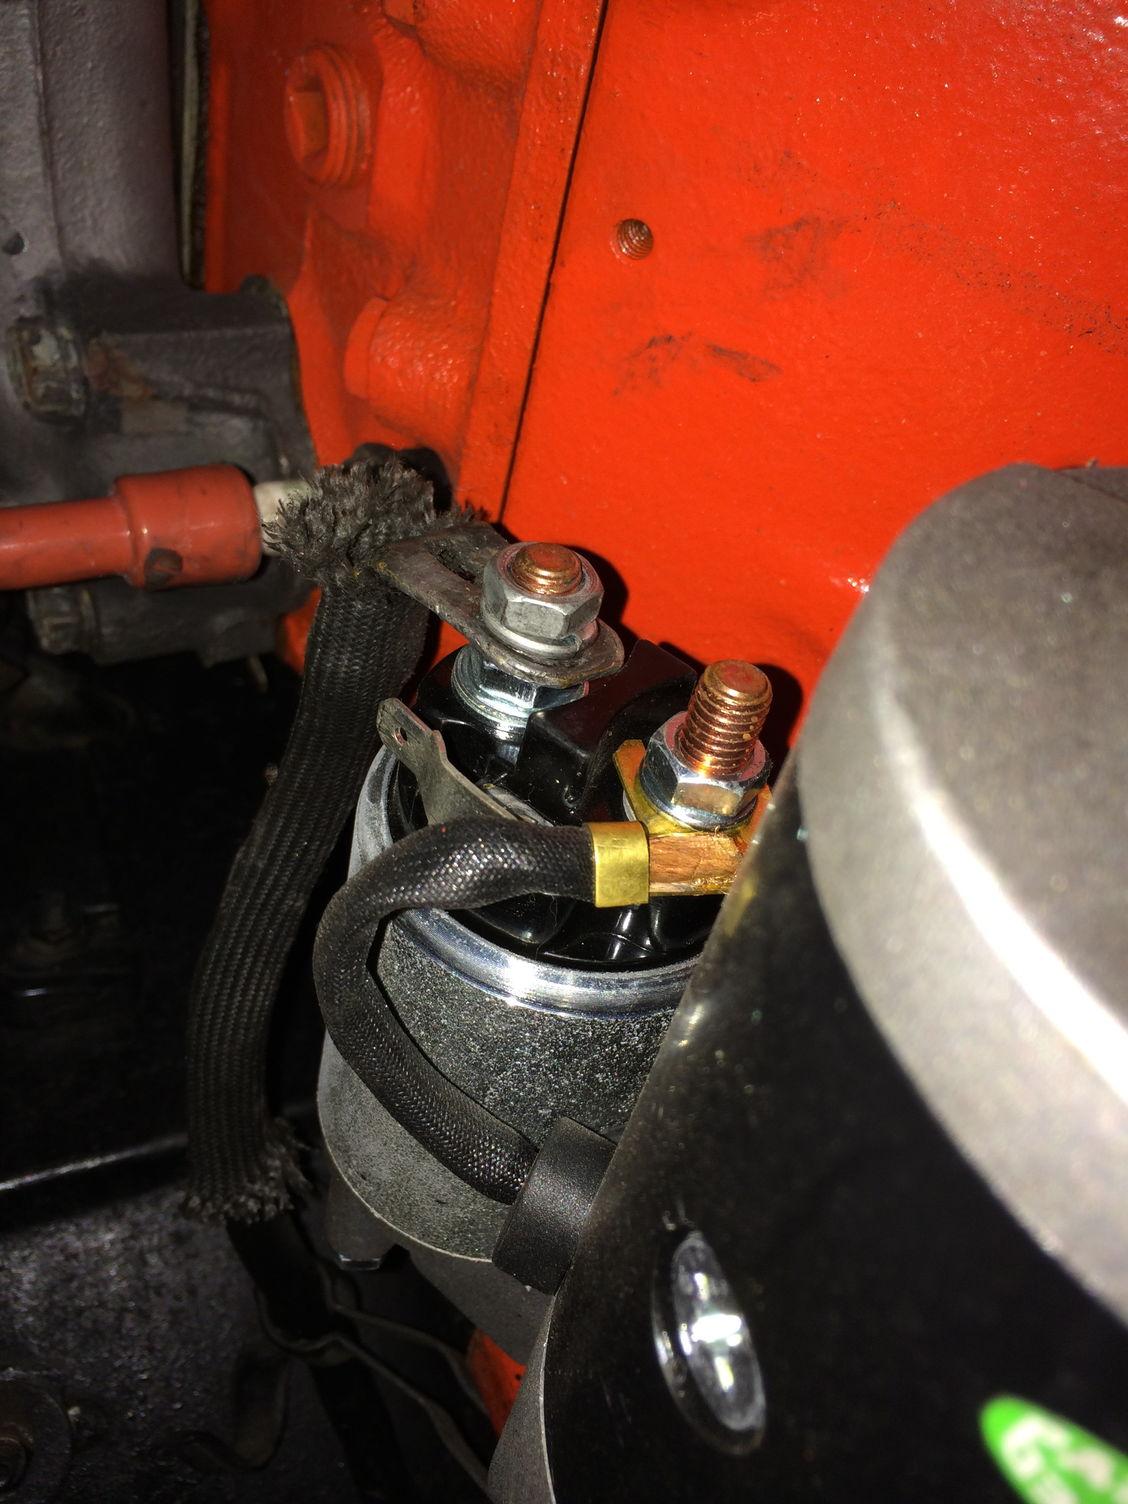 Aftermarket Starter Wiring Question